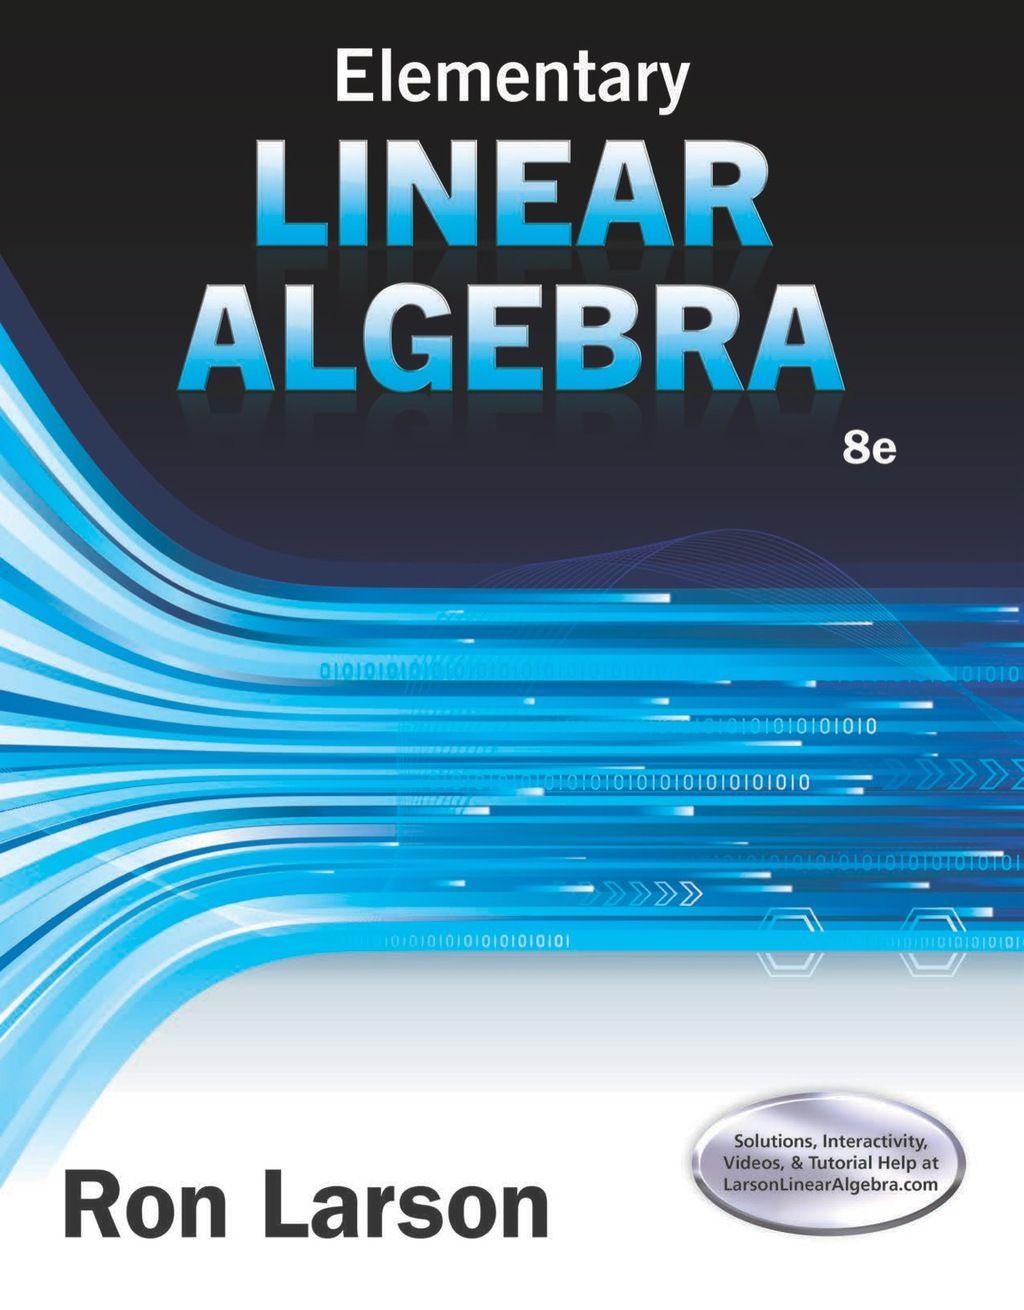 Elementary Linear Algebra (eBook Rental) | Products